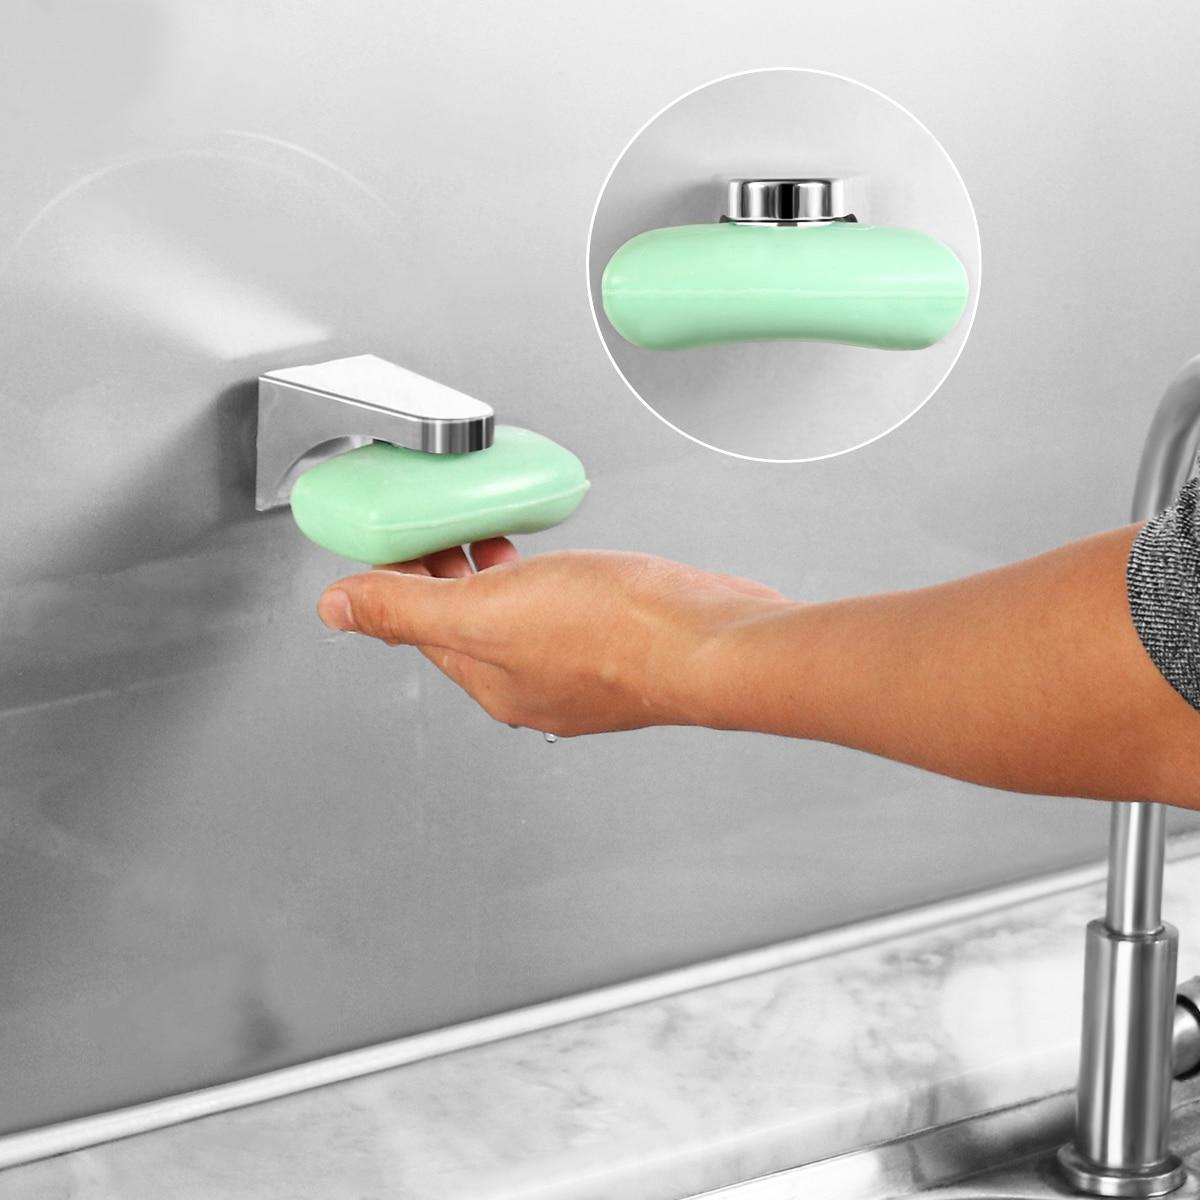 OUNONA 1PC מגנטי סבון מחזיק Elegent כלי משלוח חלד ספוג מחזיק צלחת בעל סבון צלחת עבור שירותים רחצה בית